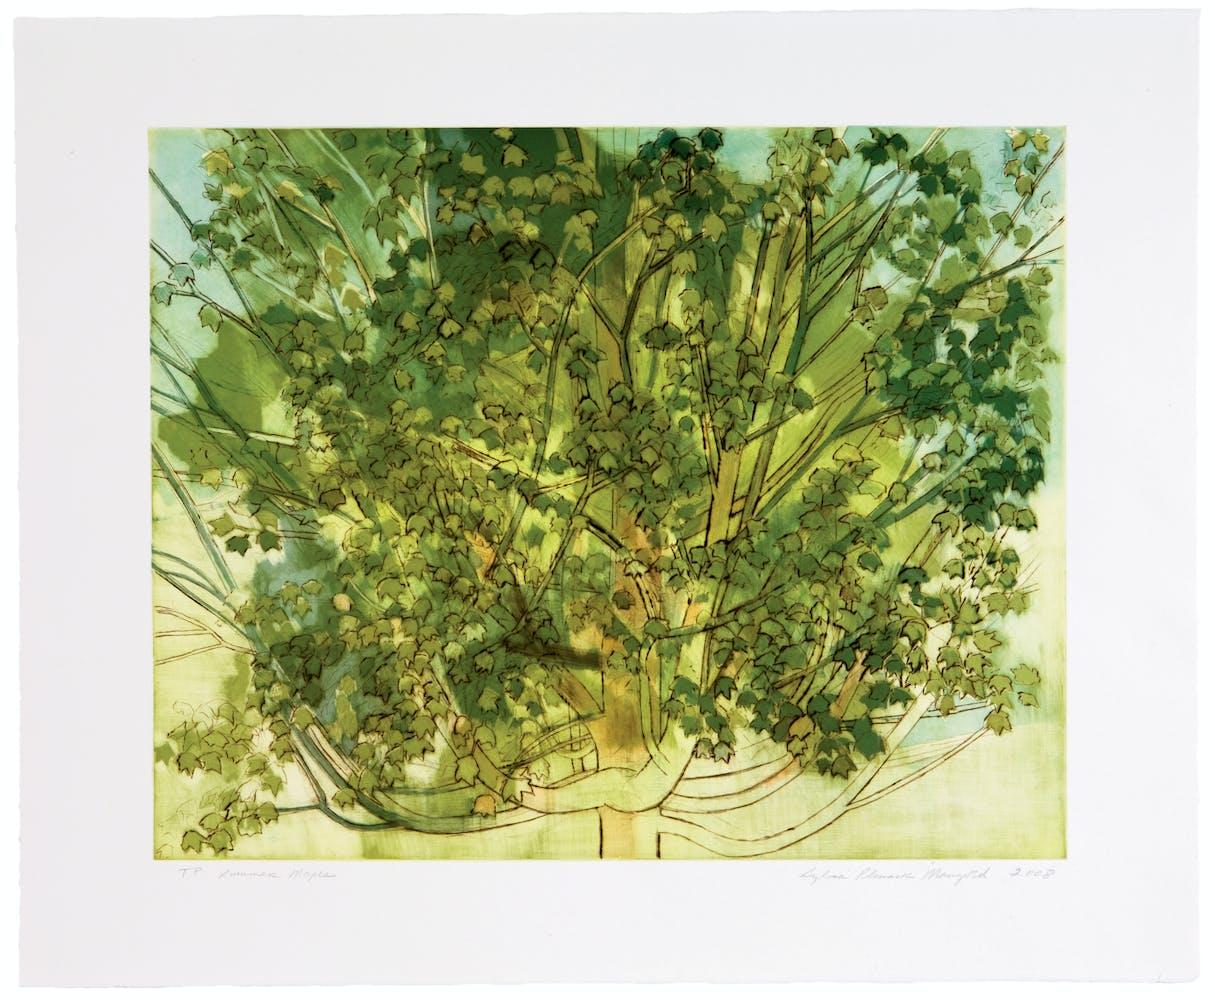 Sylvia Plimack Mangold's artwork called Summer Maple, 2008